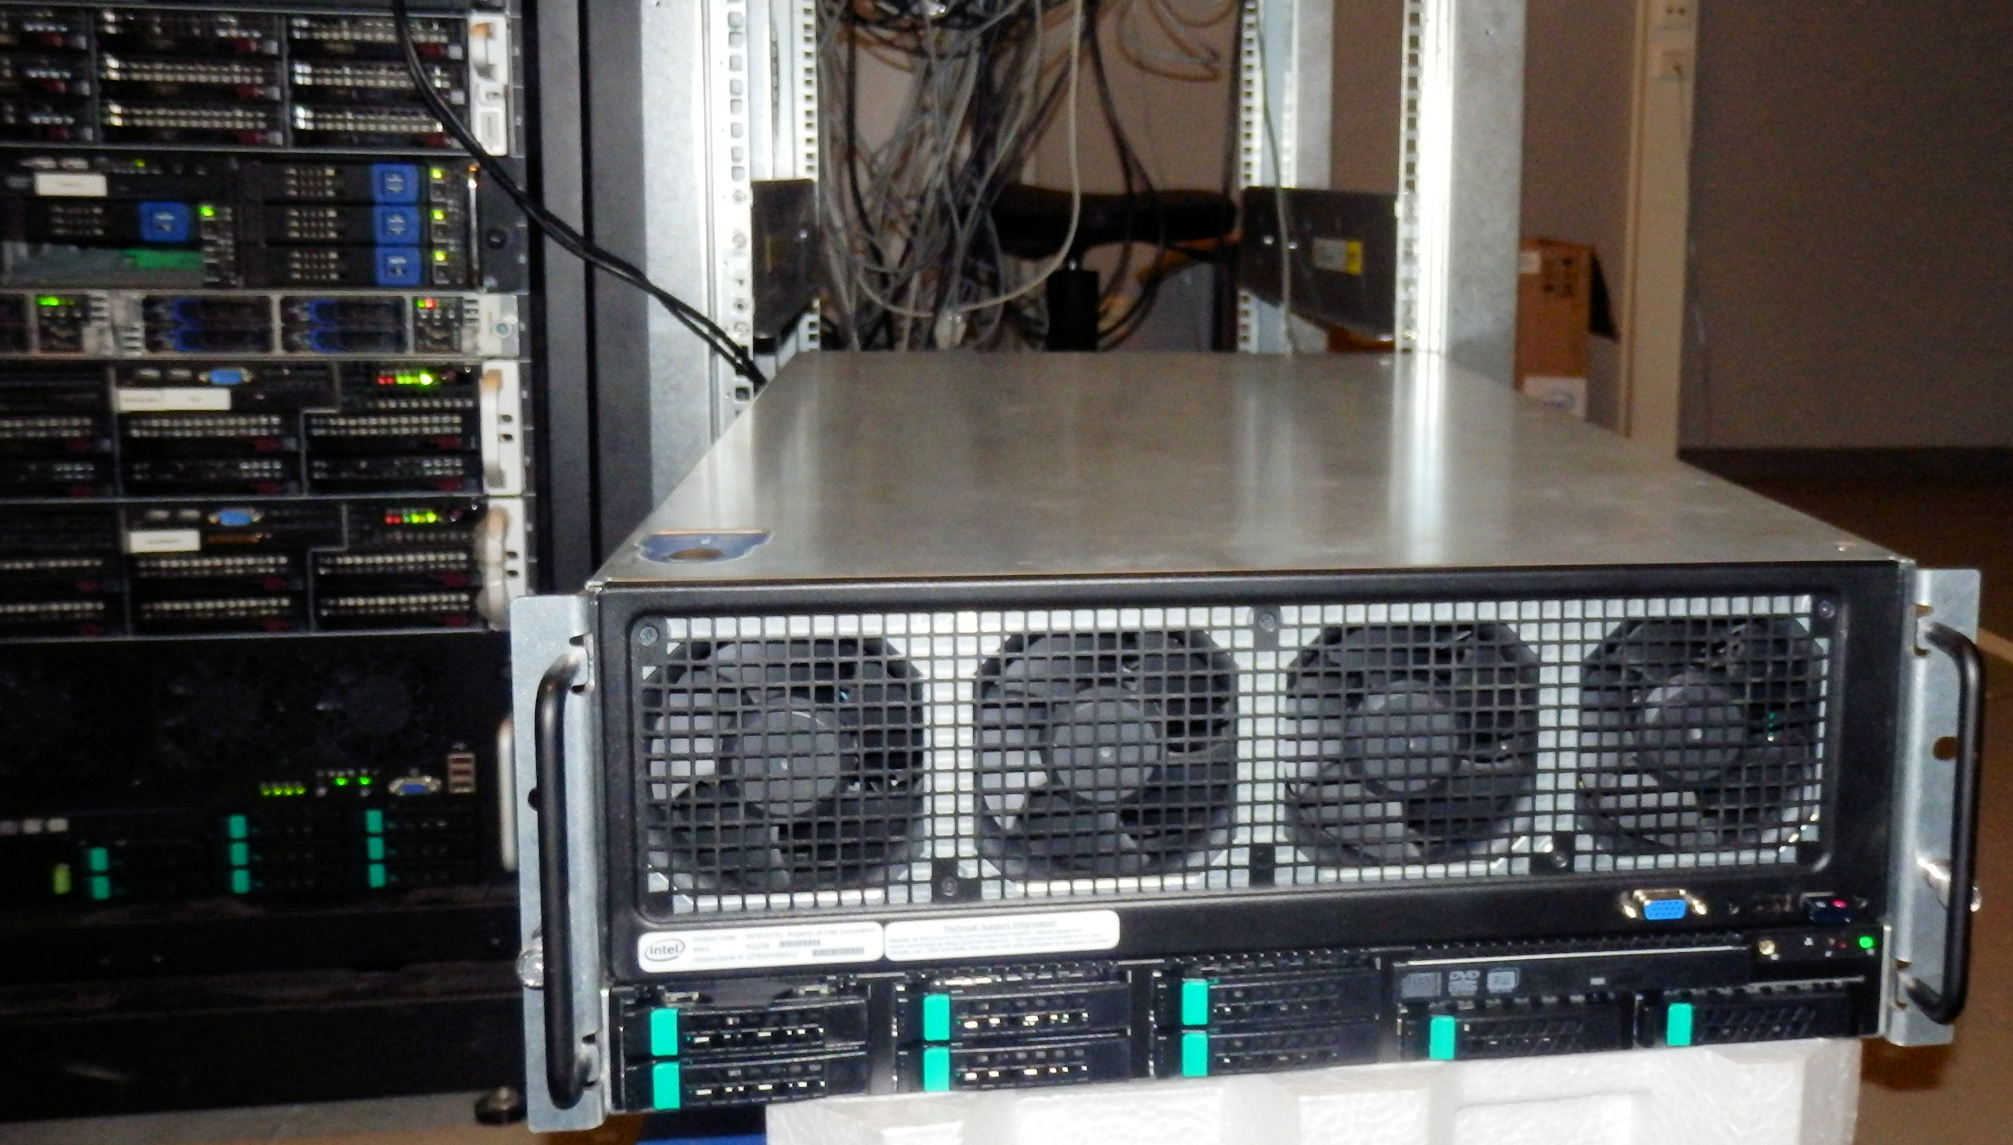 Benchmark Configuration - The Intel Xeon E7-8800 v3 Review: The